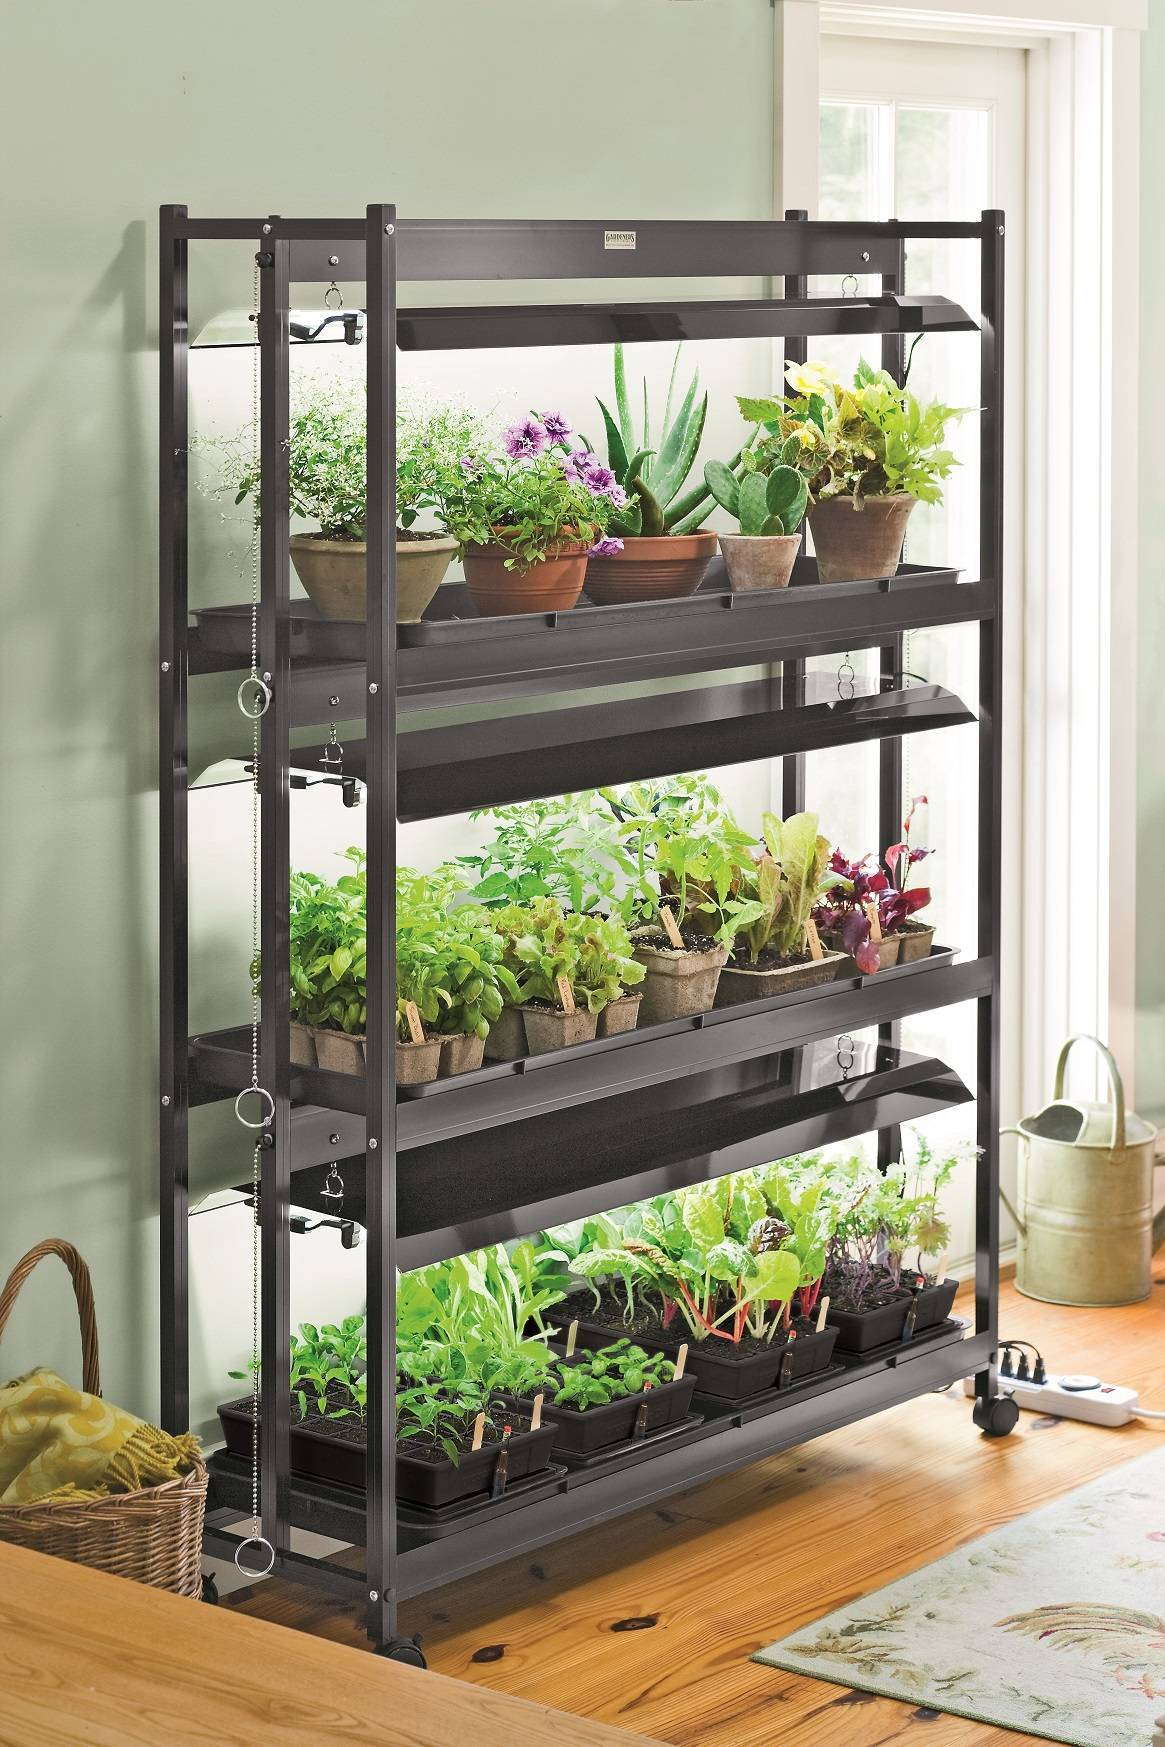 da5c85d617022a96526f_Indoor_Grow_Lights_Houseplants_photocredit_GardenersSupplyCompany.jpg